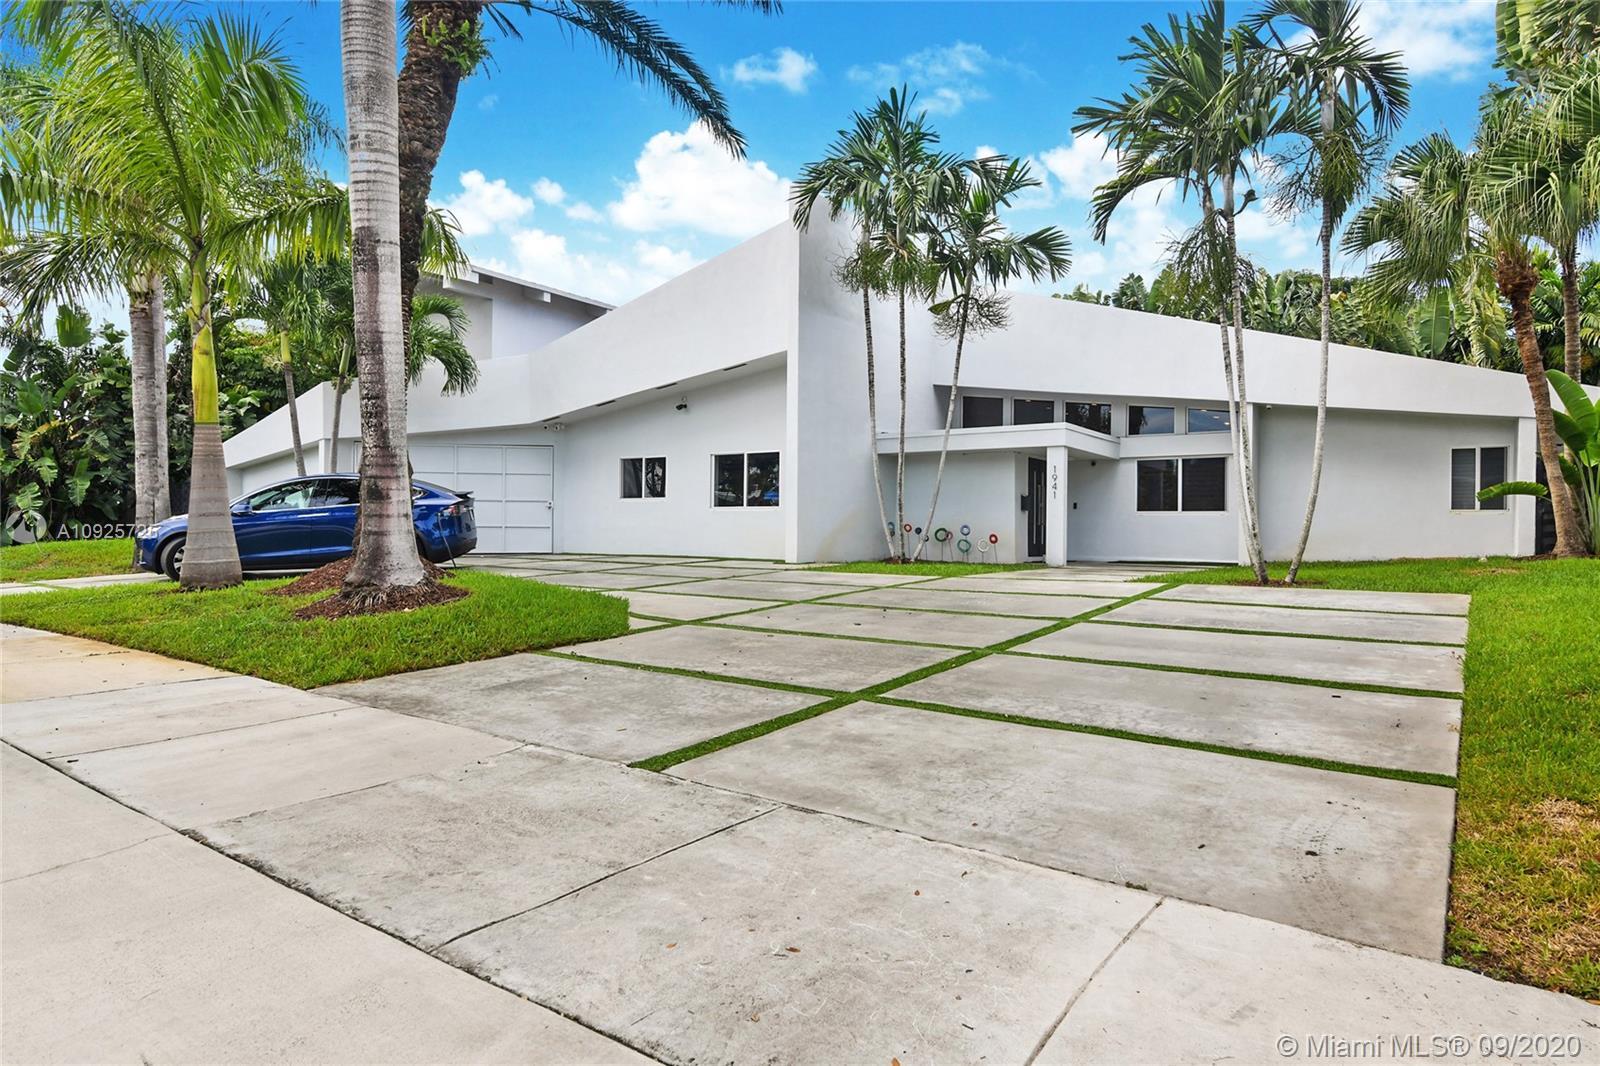 Highland Woods - 1941 NE 197th Ter, Miami, FL 33179